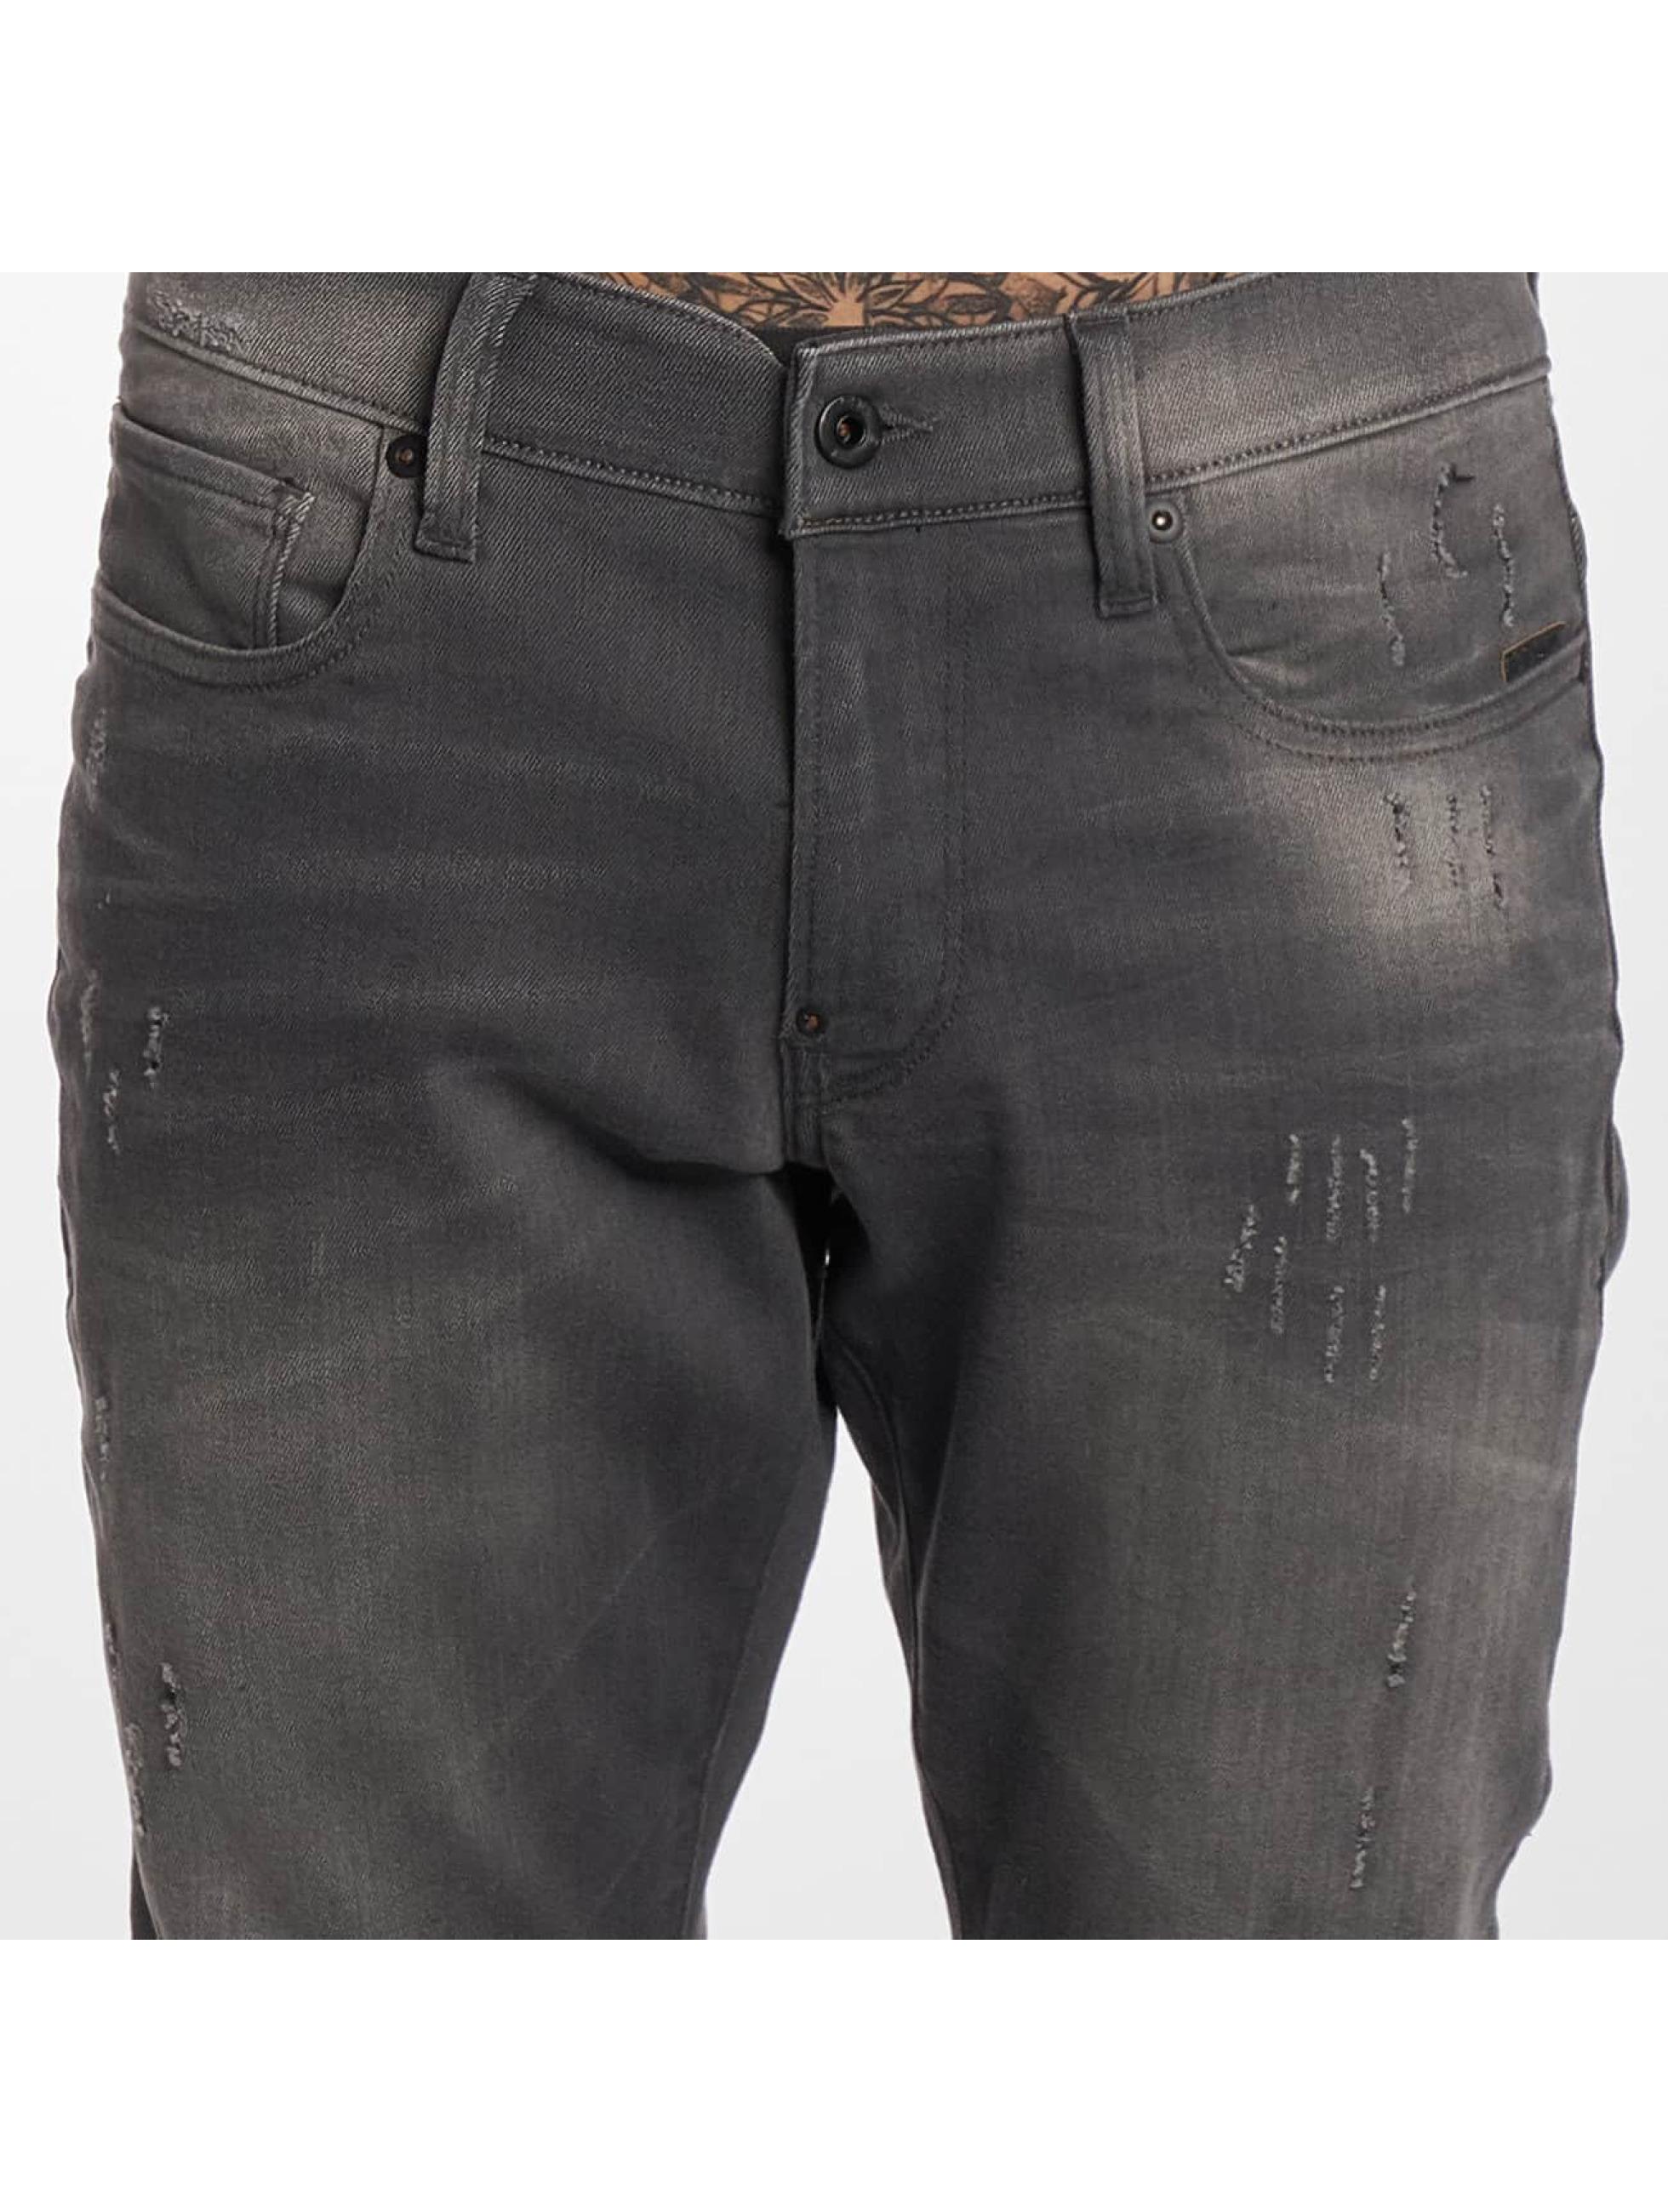 G-Star Slim Fit Jeans Revend Super серый